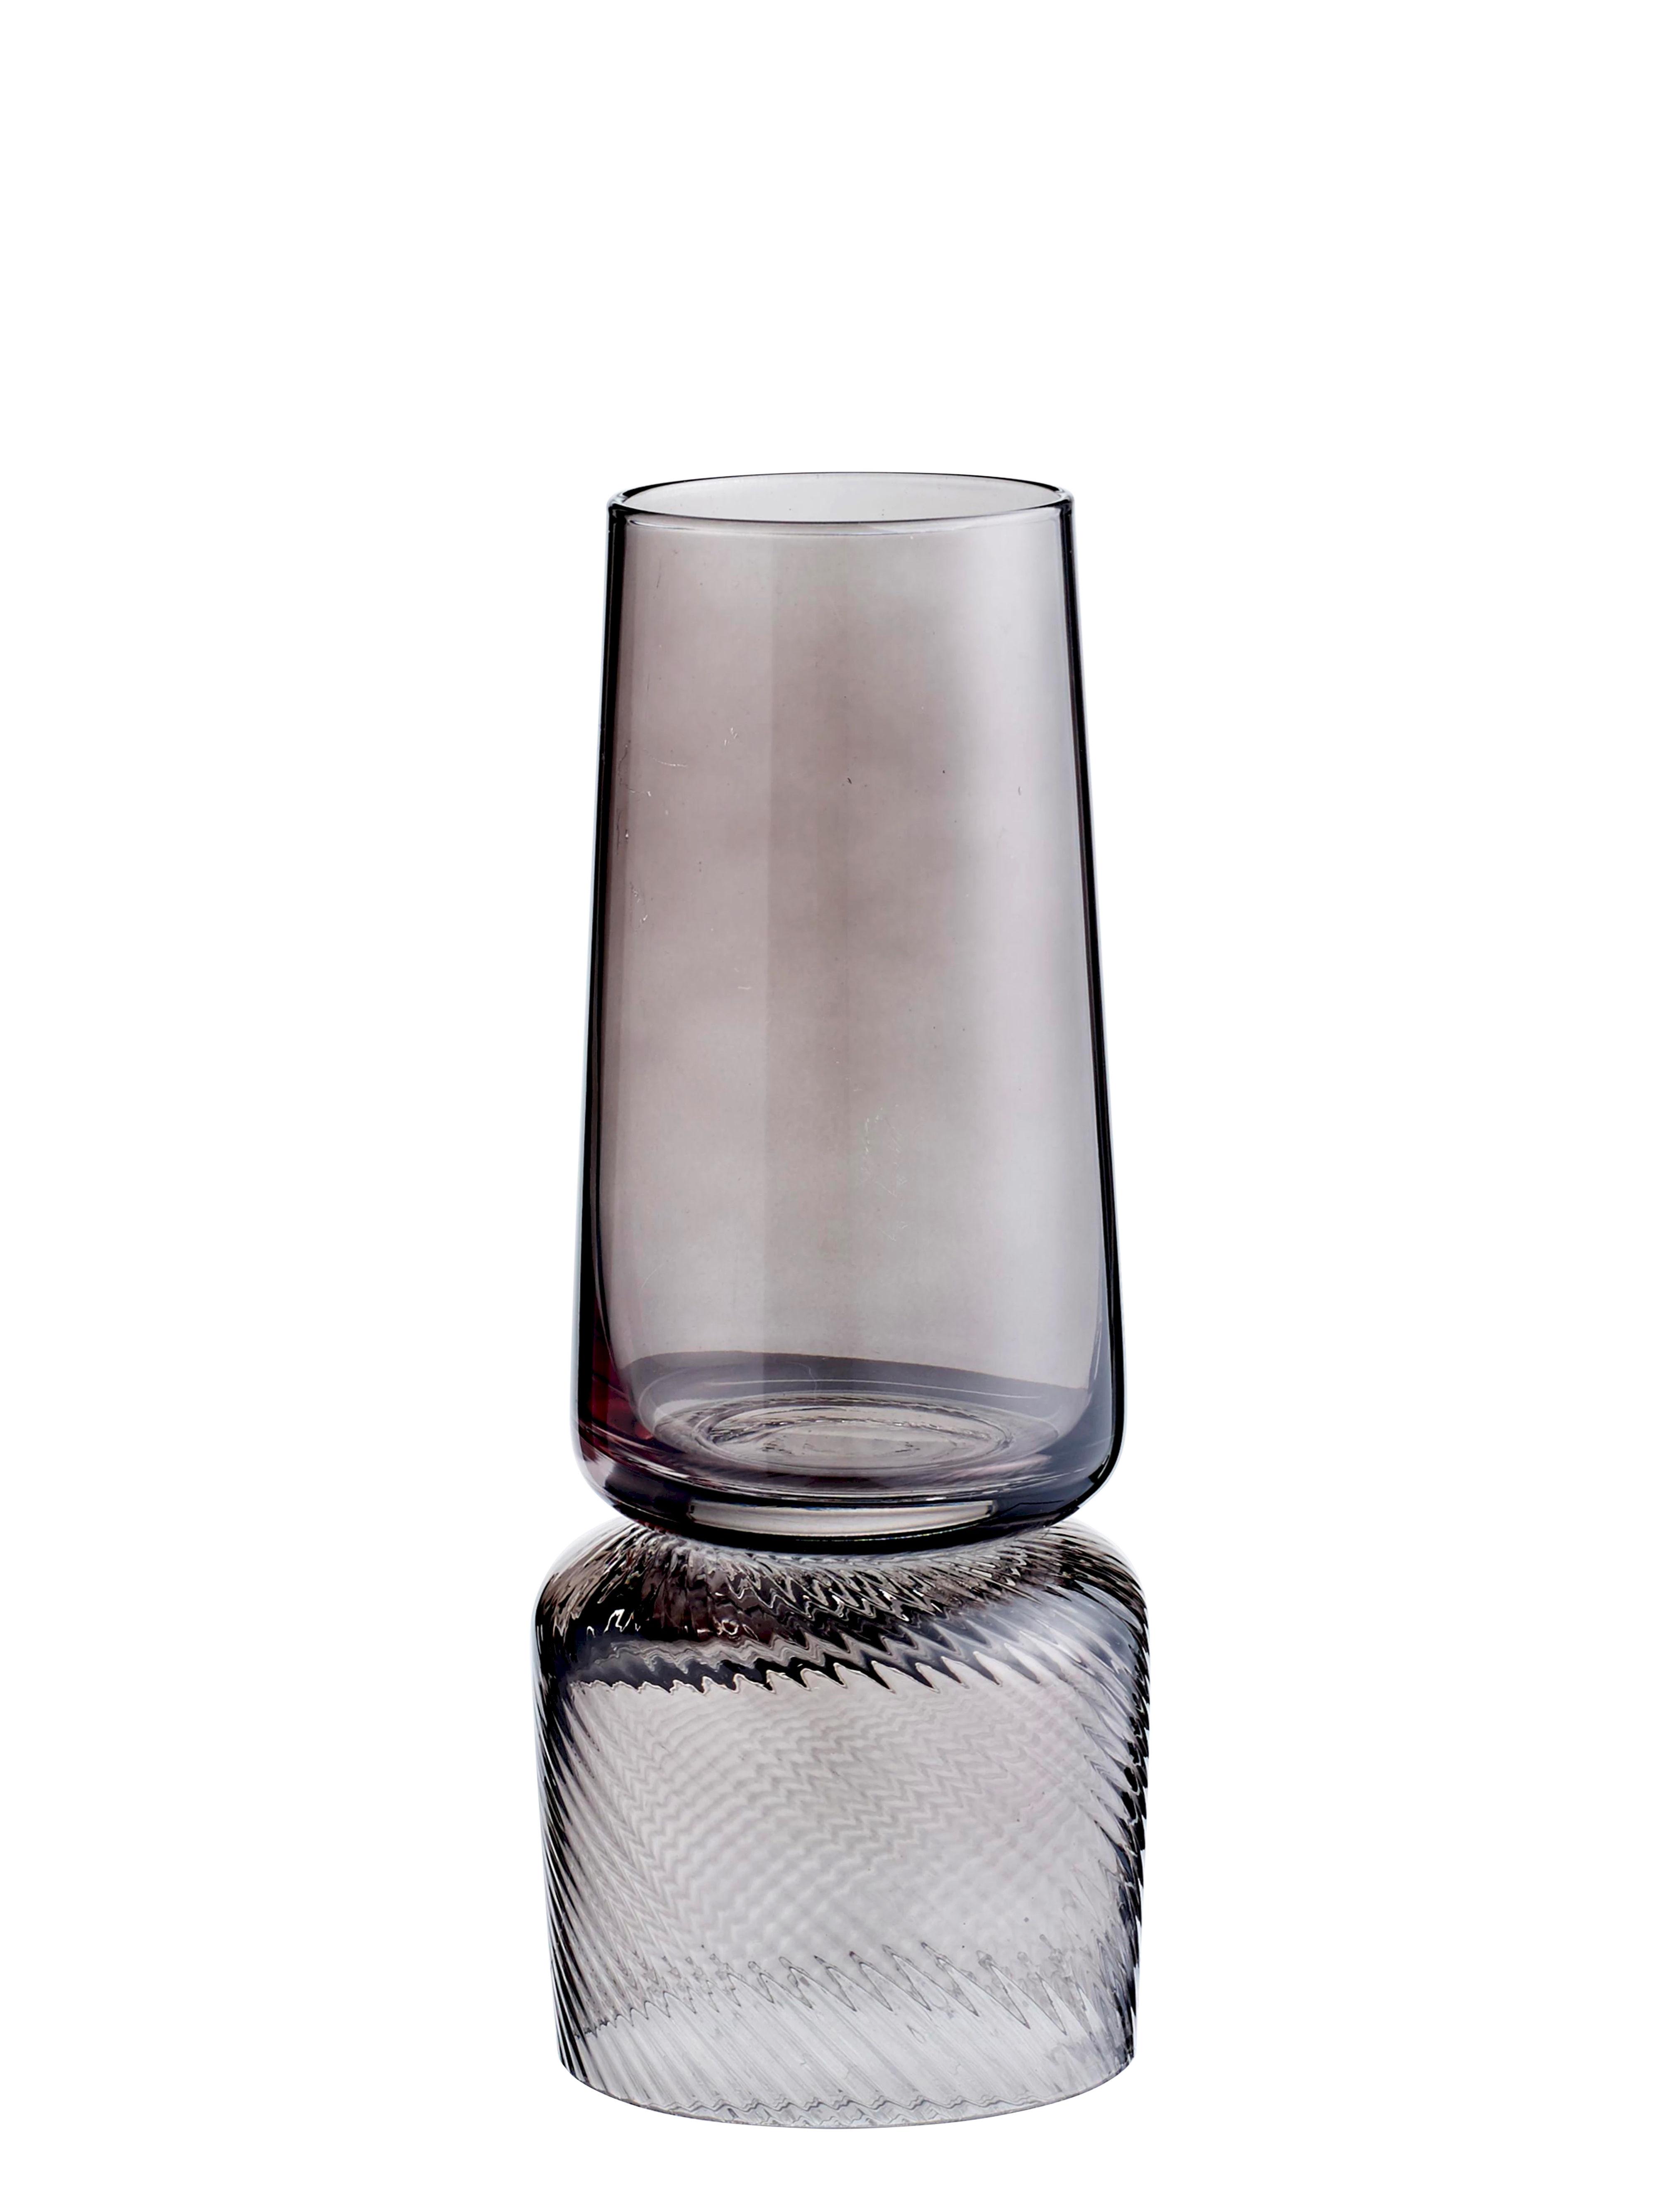 Interni - Vasi - Vaso Doppio - / Portacandela - Reversibile di Bolia - Grigio fumé - Vetro colorato